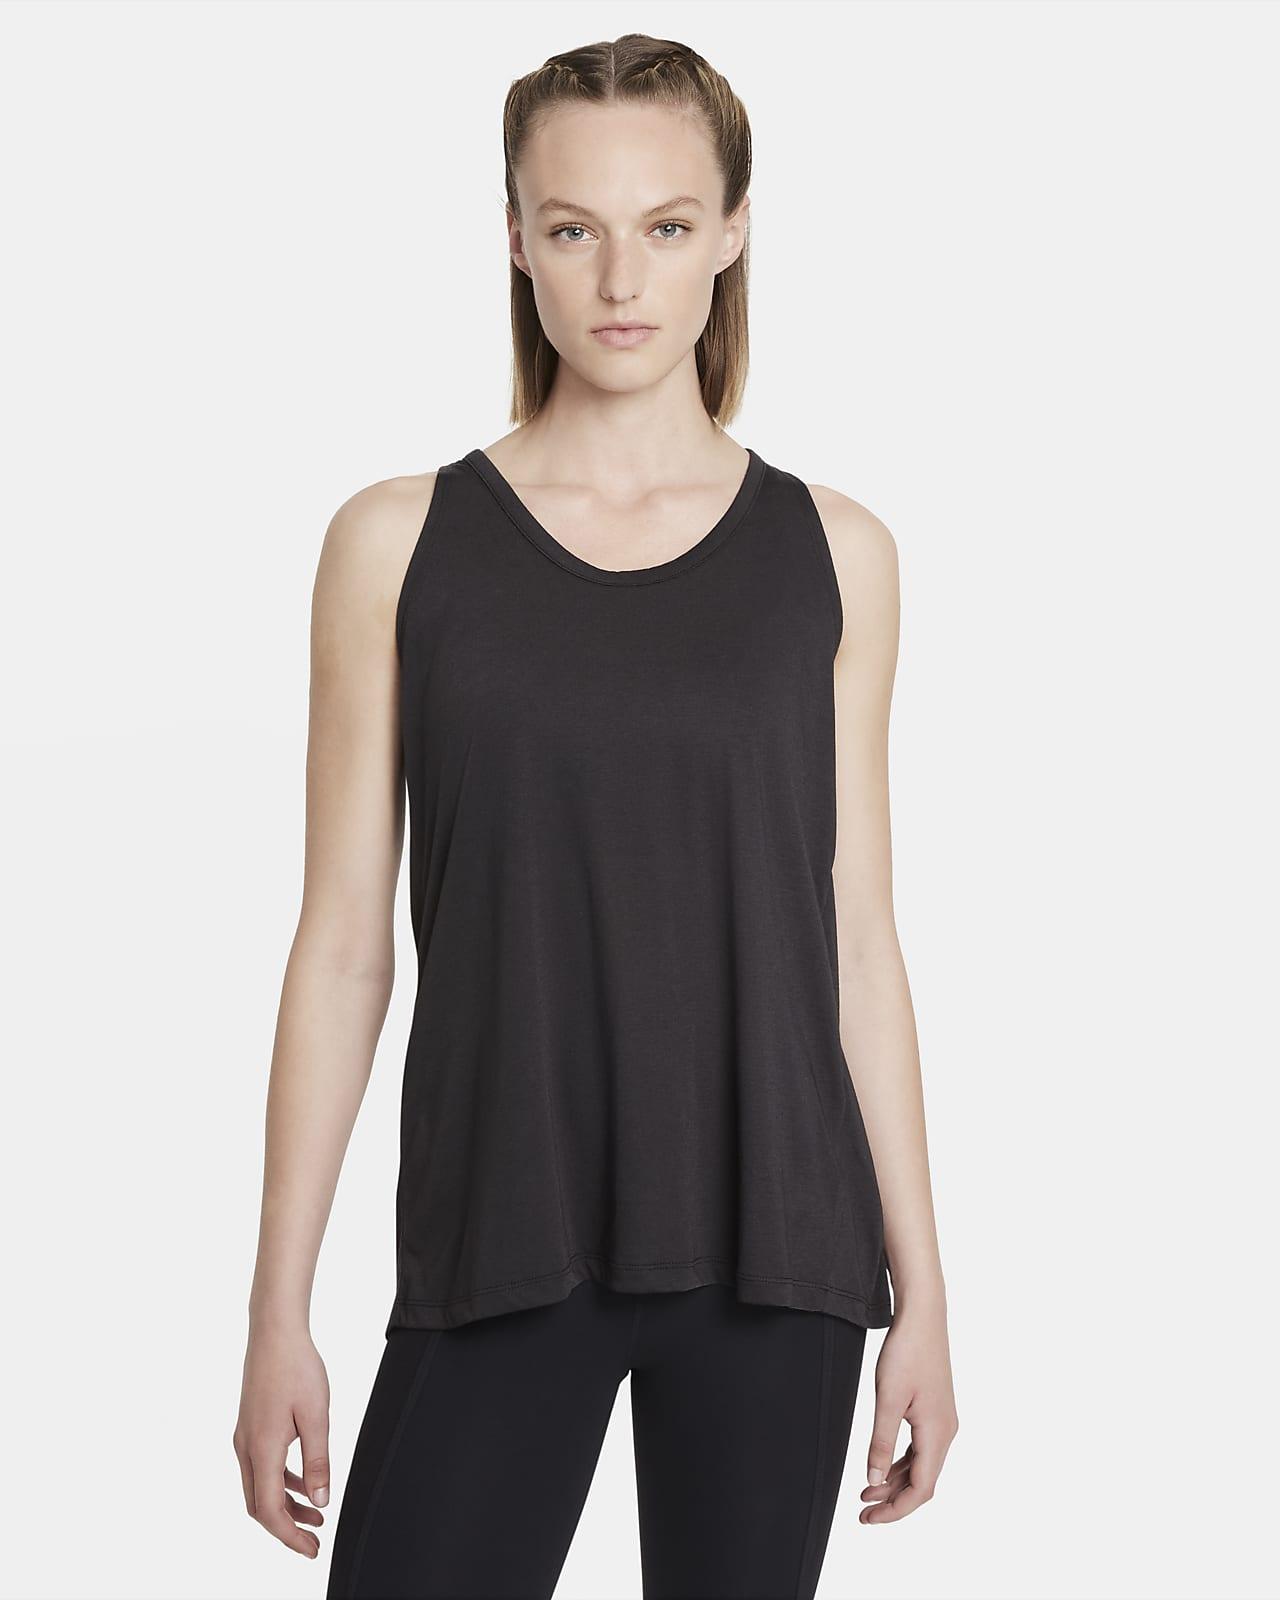 Camiseta de tirantes para mujer Nike Yoga Dri-FIT